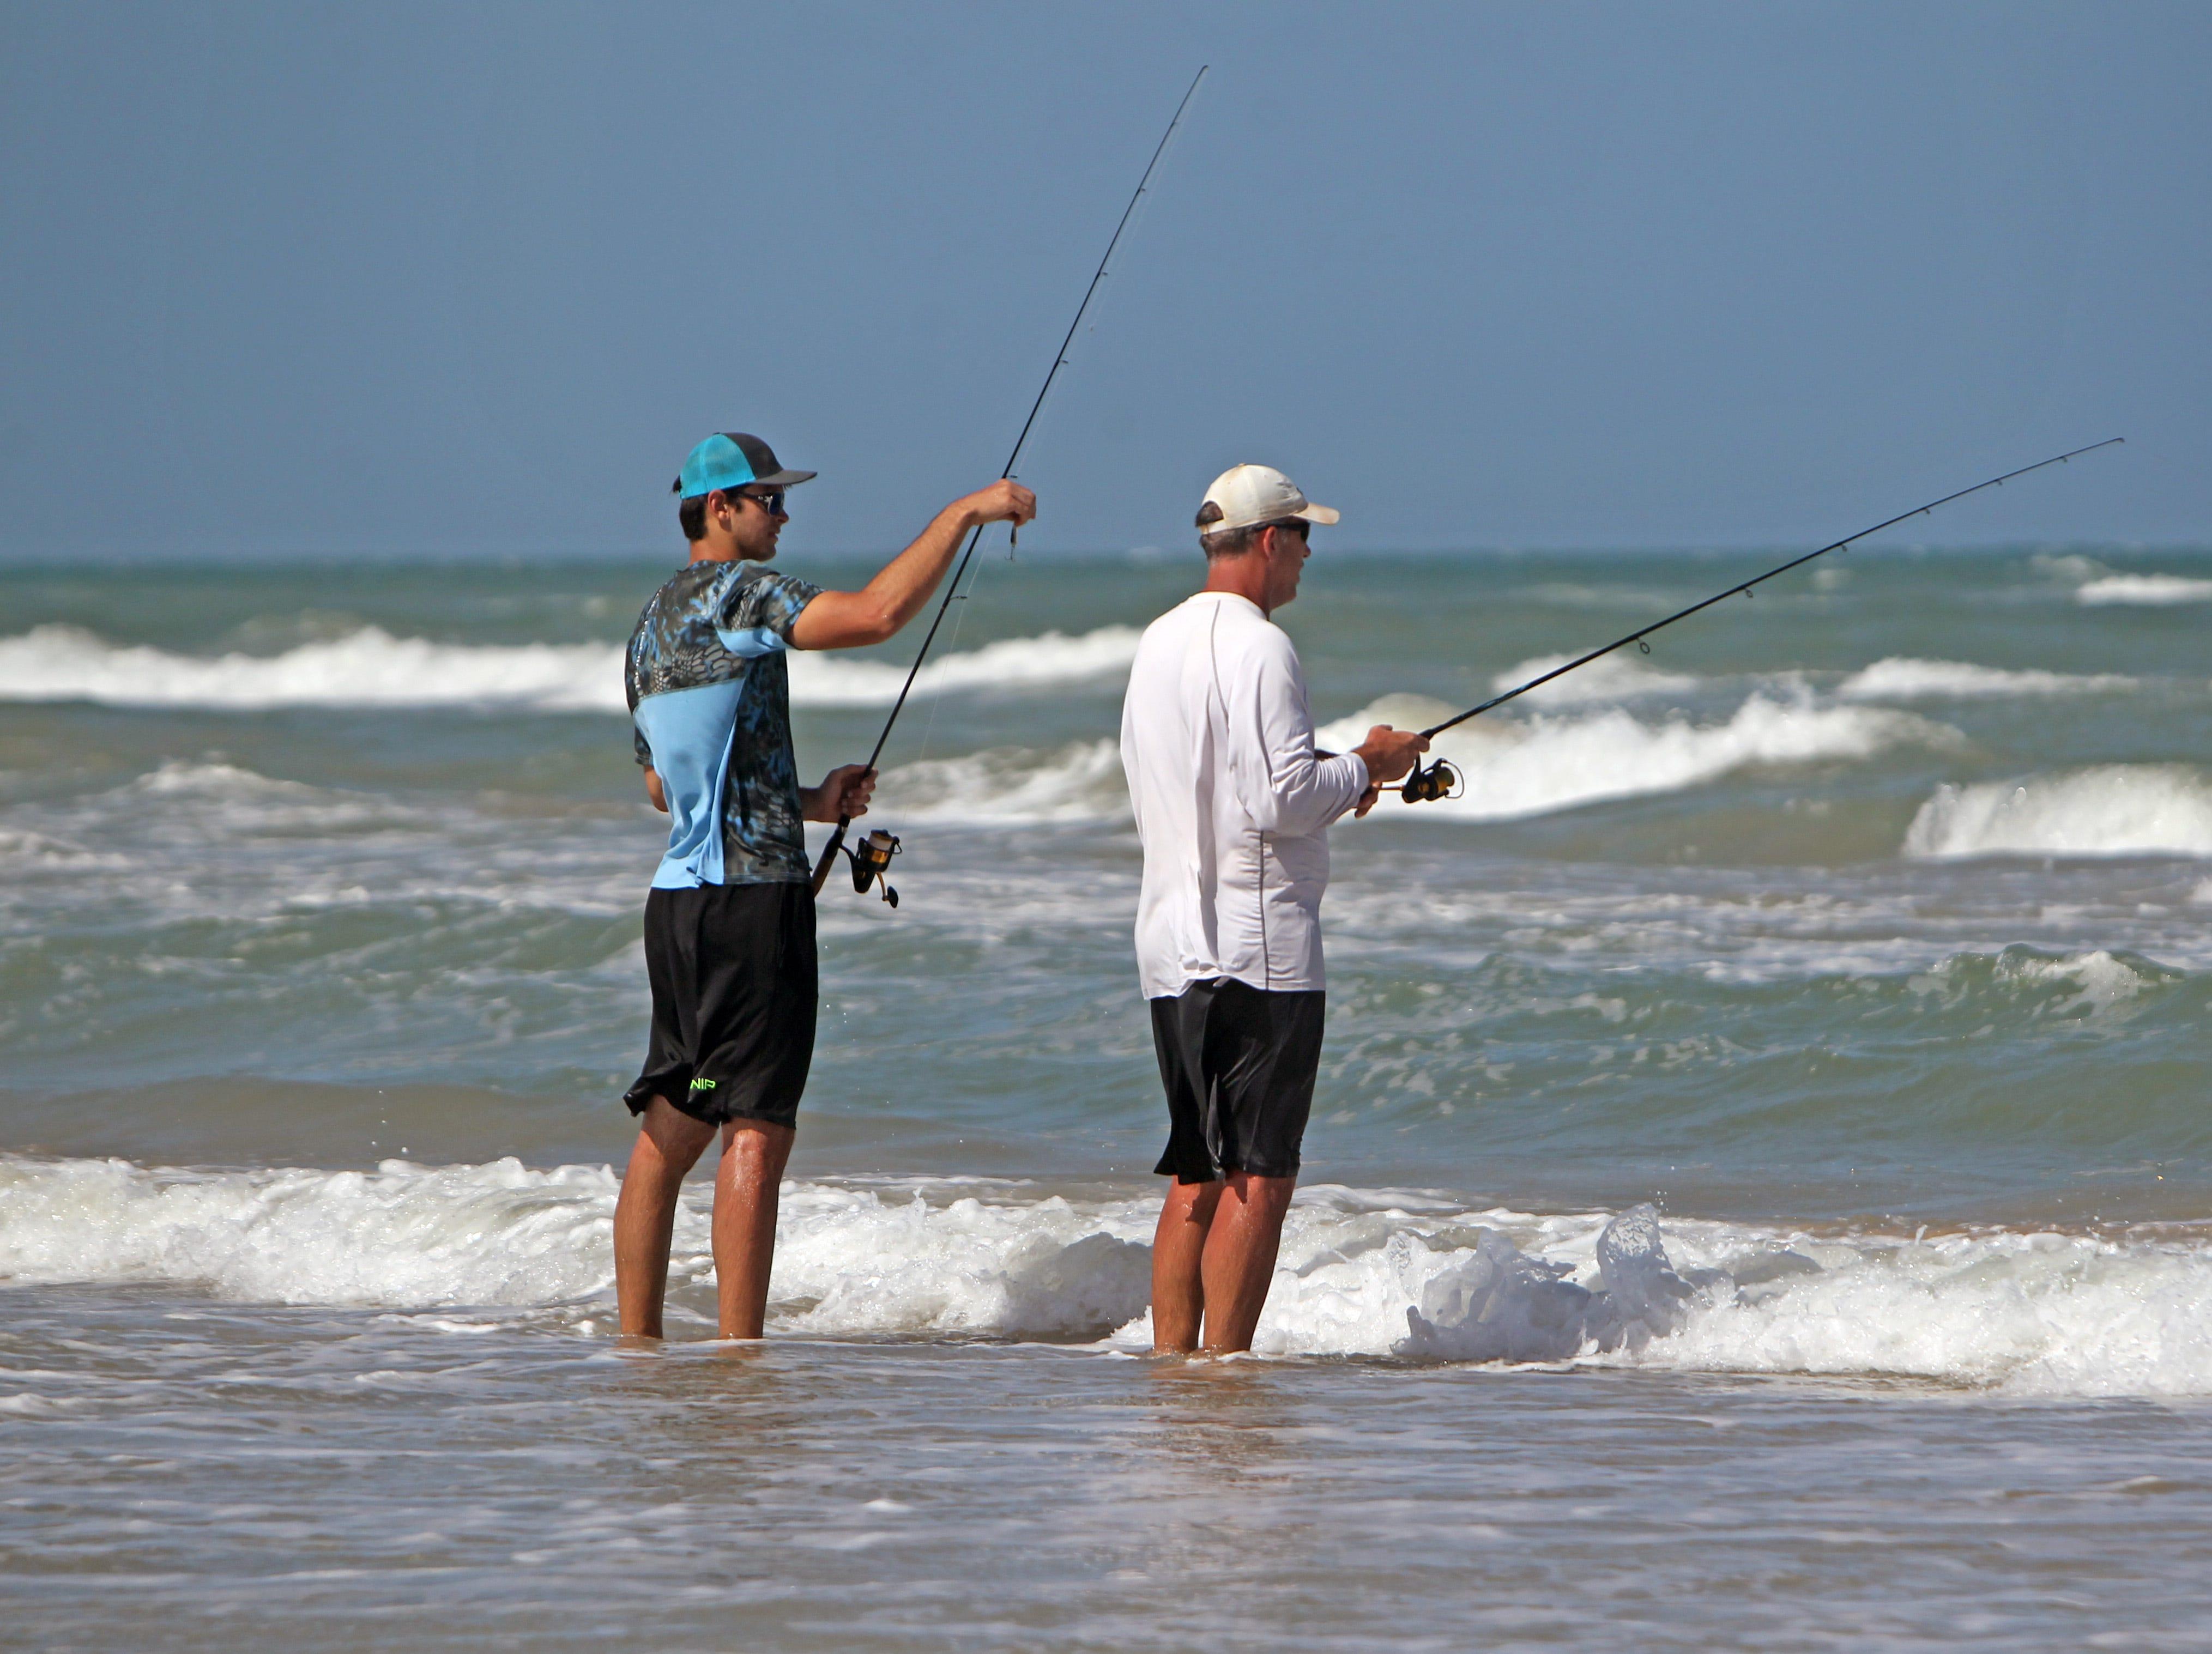 Luke and Steve McGhee began fishing on Padre Island National Seashore when Luke was a senior in high school and Steve was his coach.